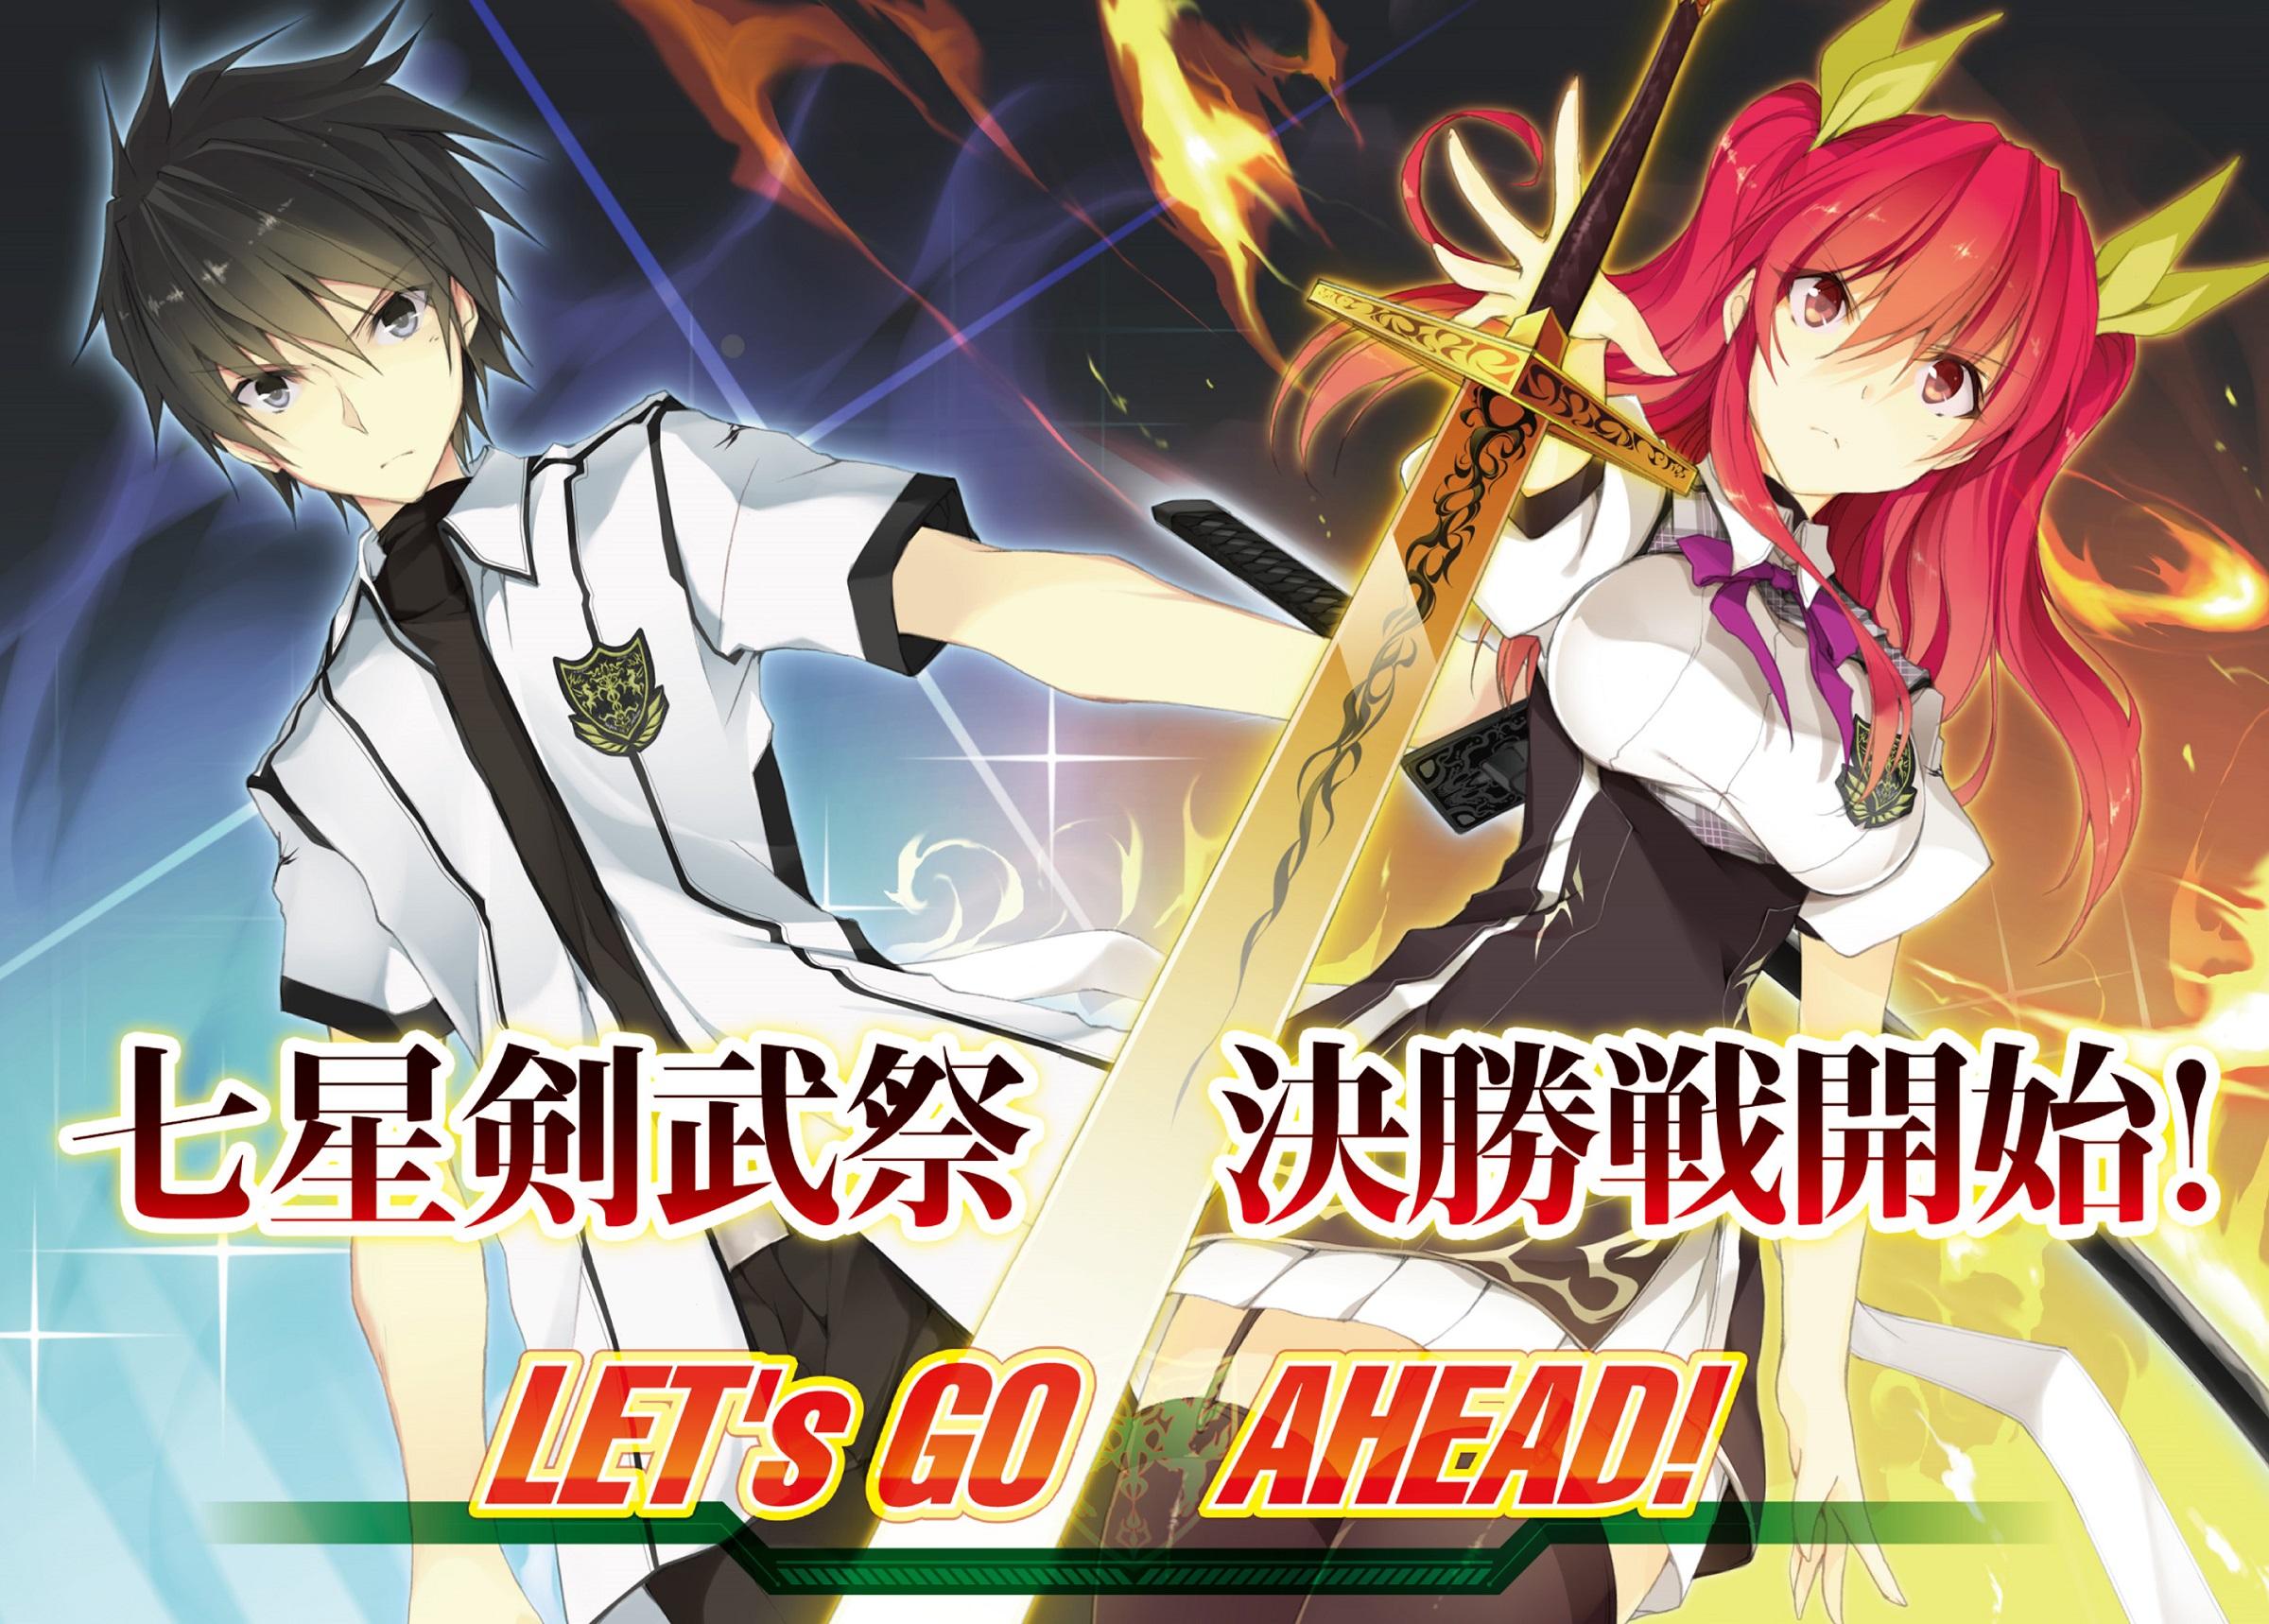 Rakudai Kishi No Cavalry Ger Sub Staffel 1